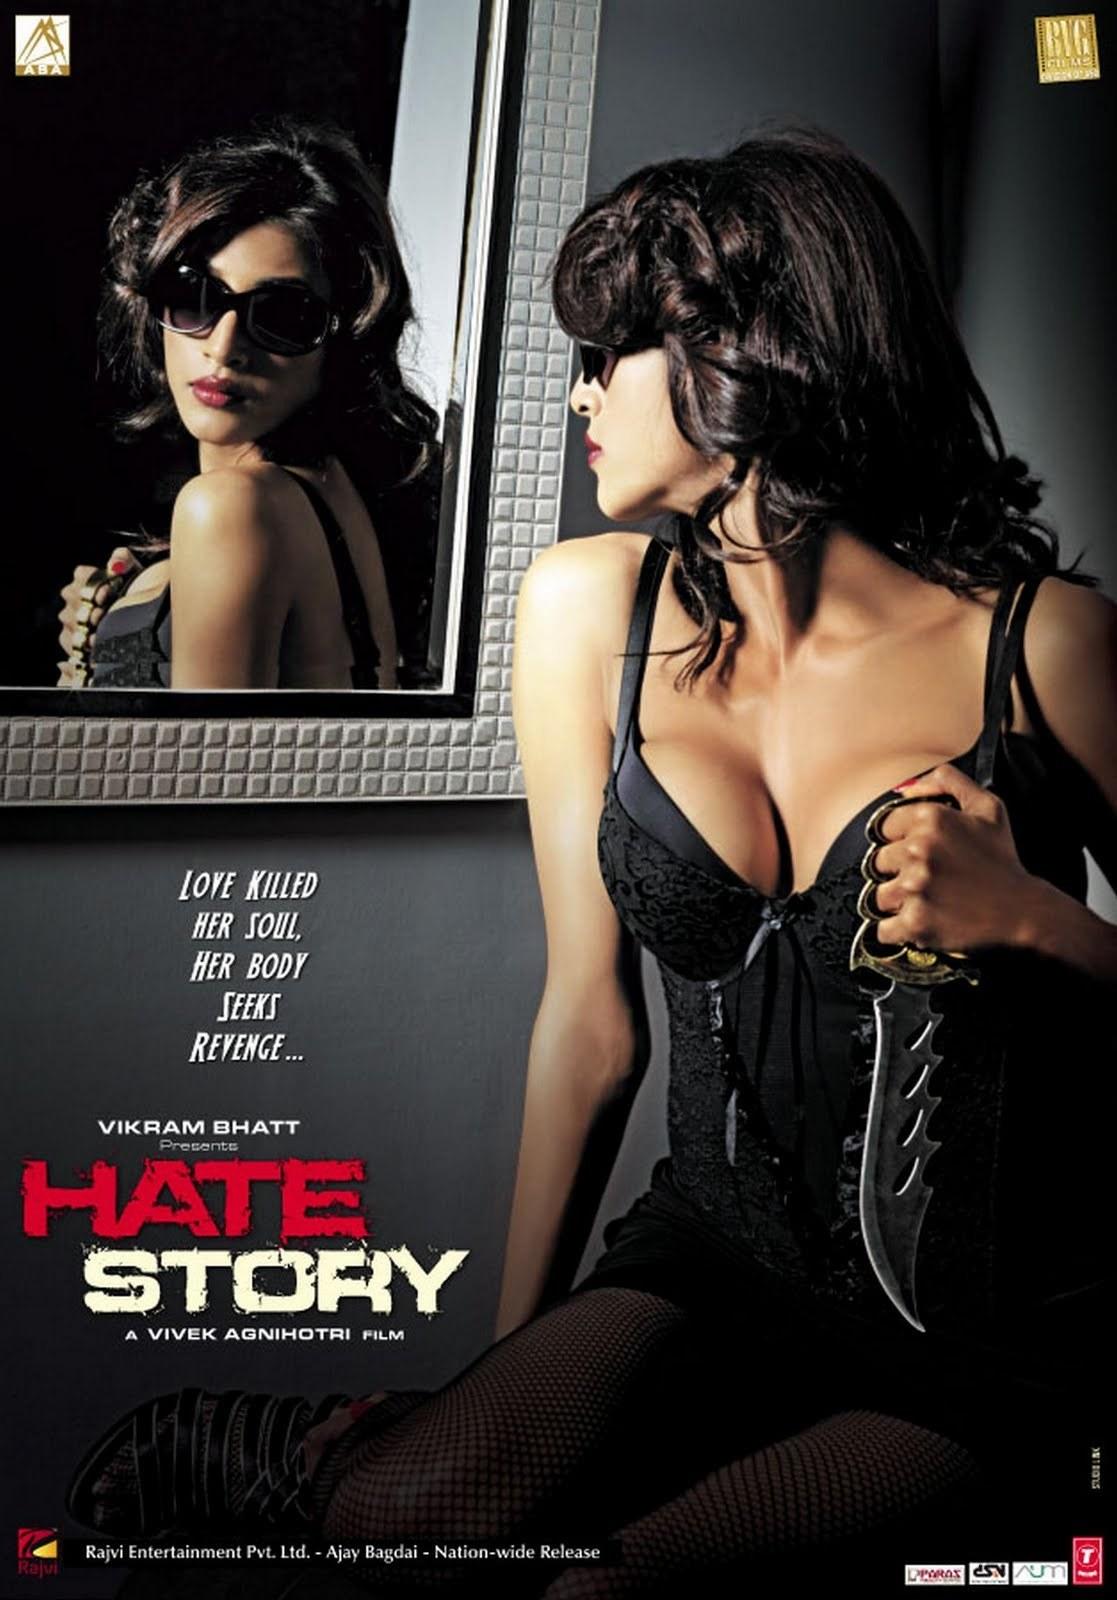 Hate story sex scene video